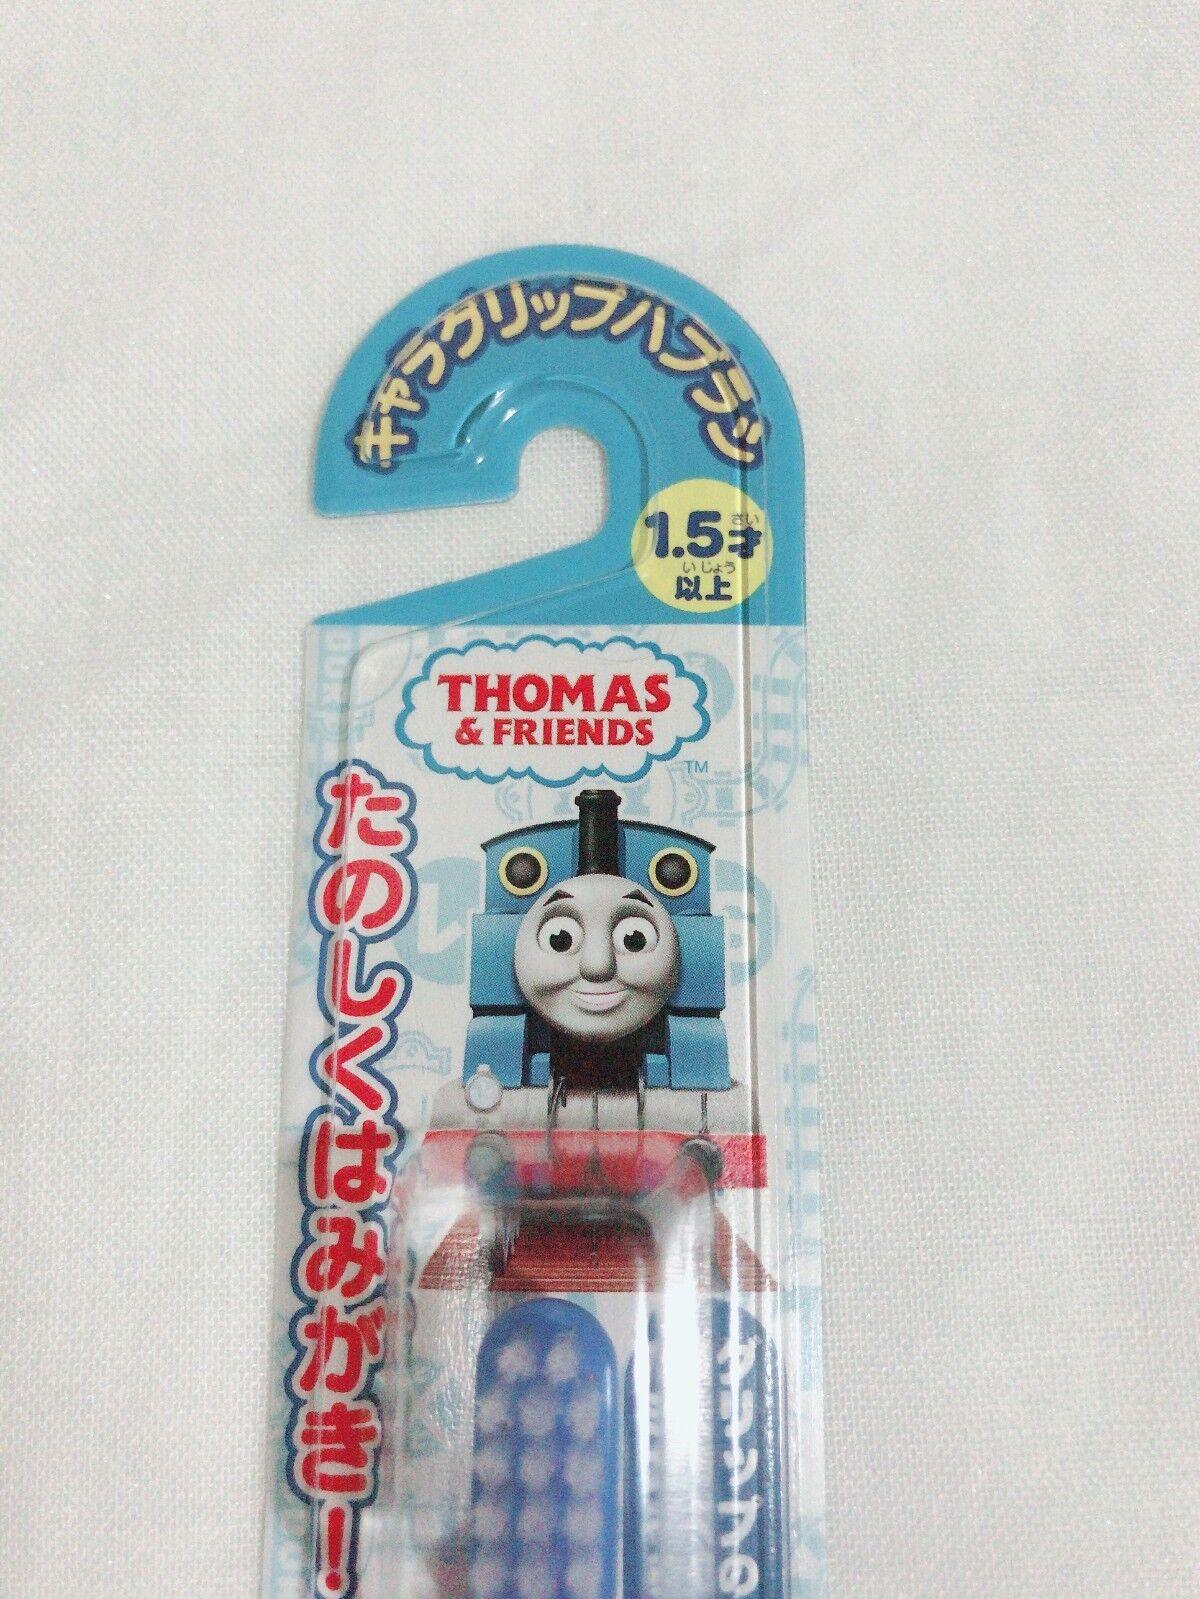 Bandai Children Toothbrush Three Set Thomas The Tank Engine